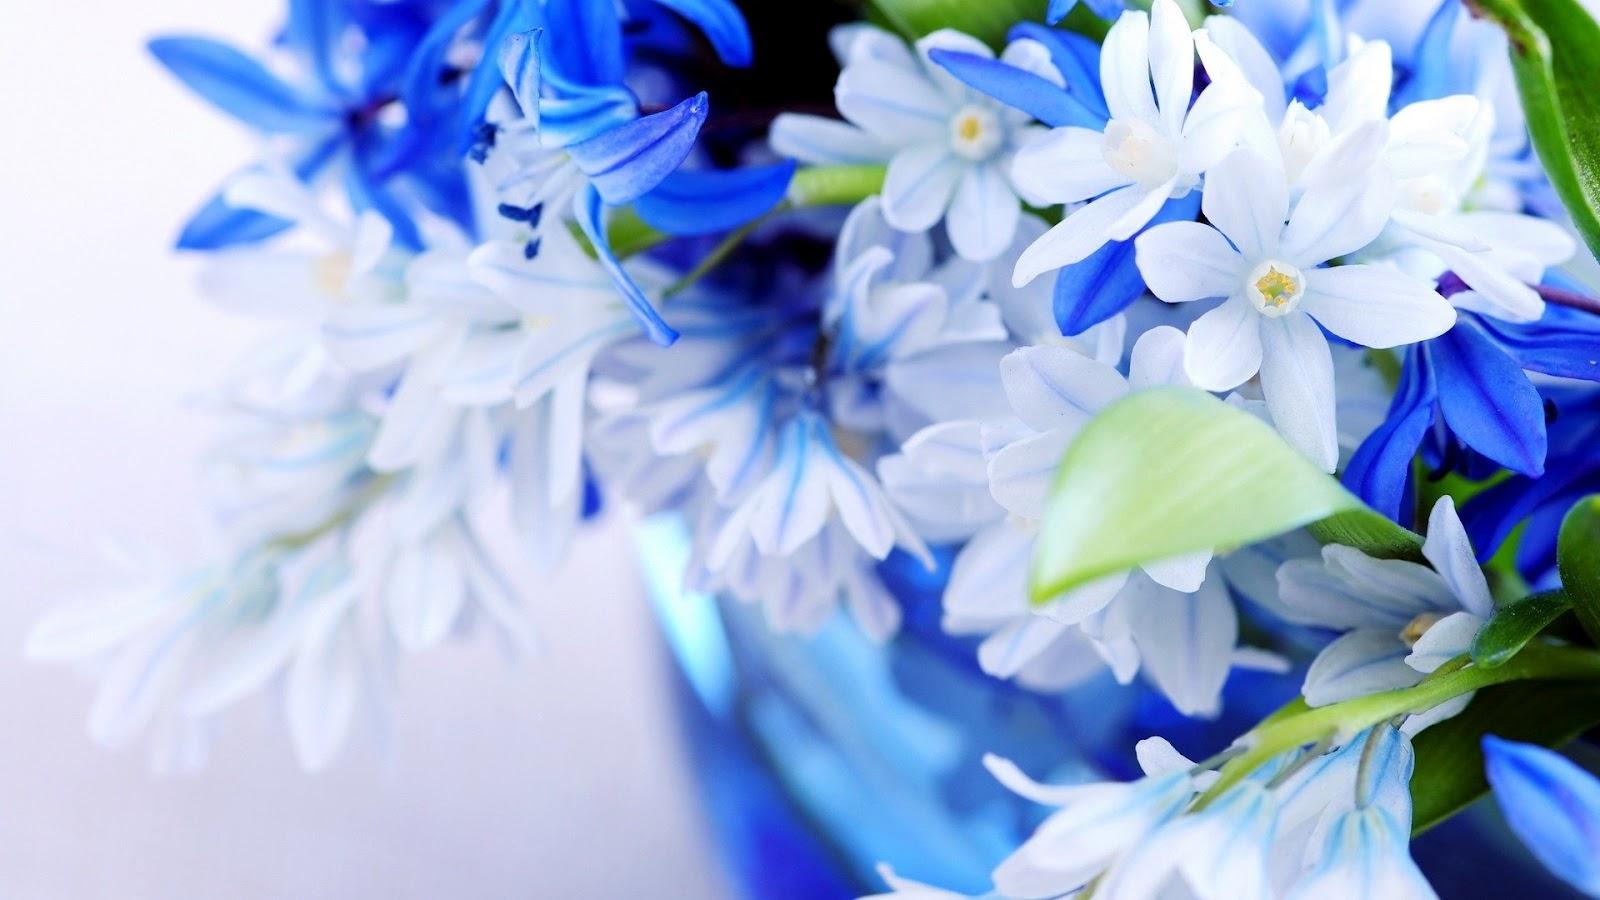 http://3.bp.blogspot.com/-HhQhEH5q0_E/UCqXsuCghAI/AAAAAAAADwc/ACnUr7uM7mM/s1600/natural-flowers-bouquet-1920x1080.jpg